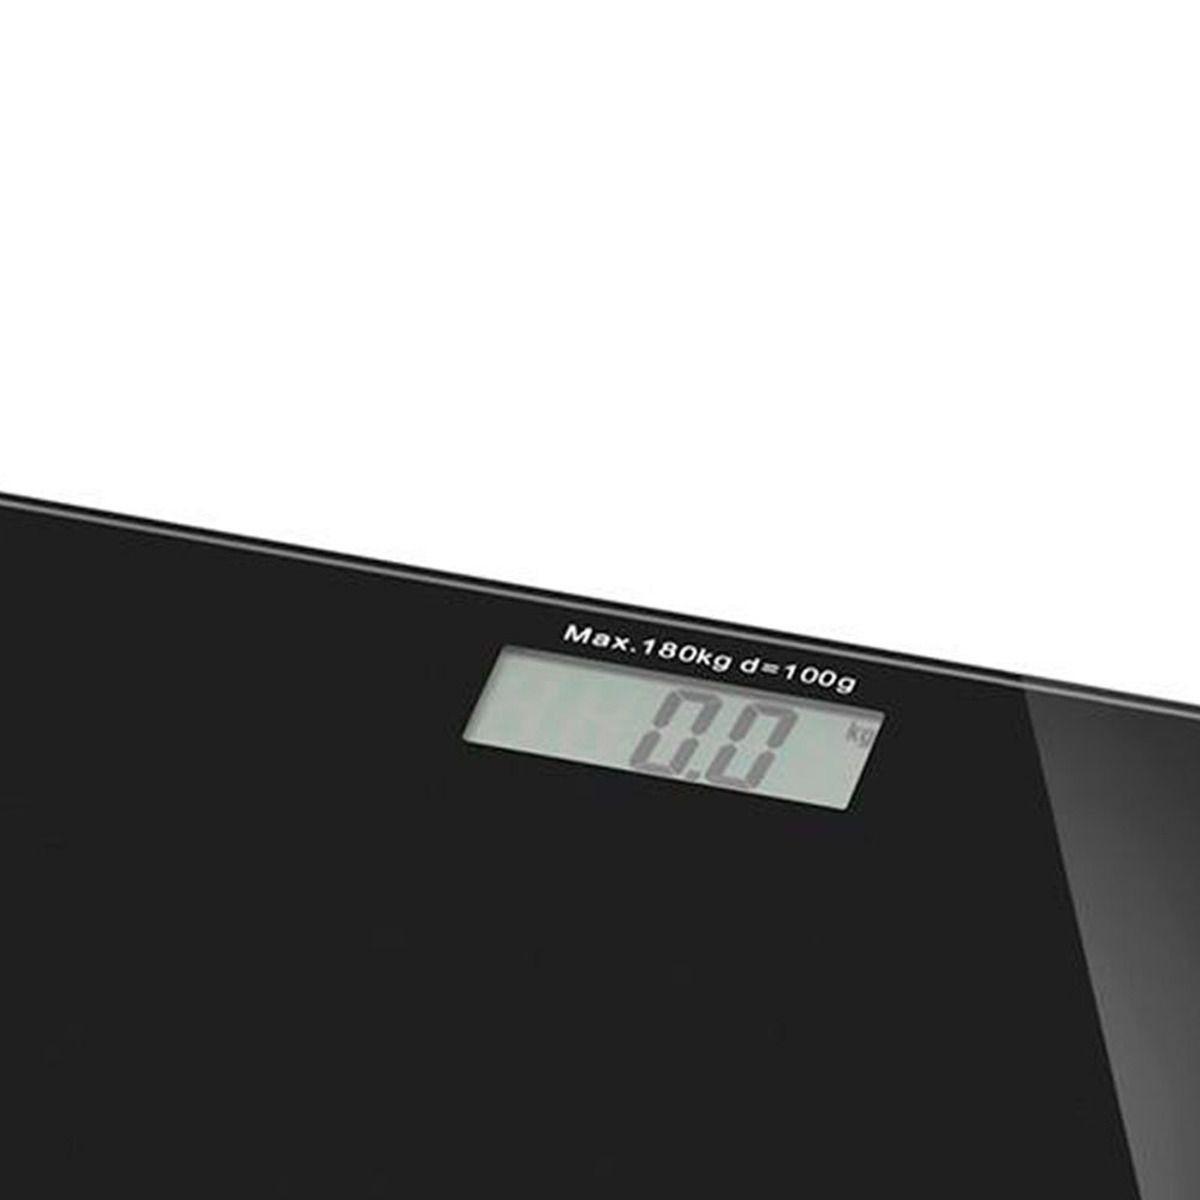 Balança Digital Vidro Lcd 180kg Banheiro Multilaser Hc022